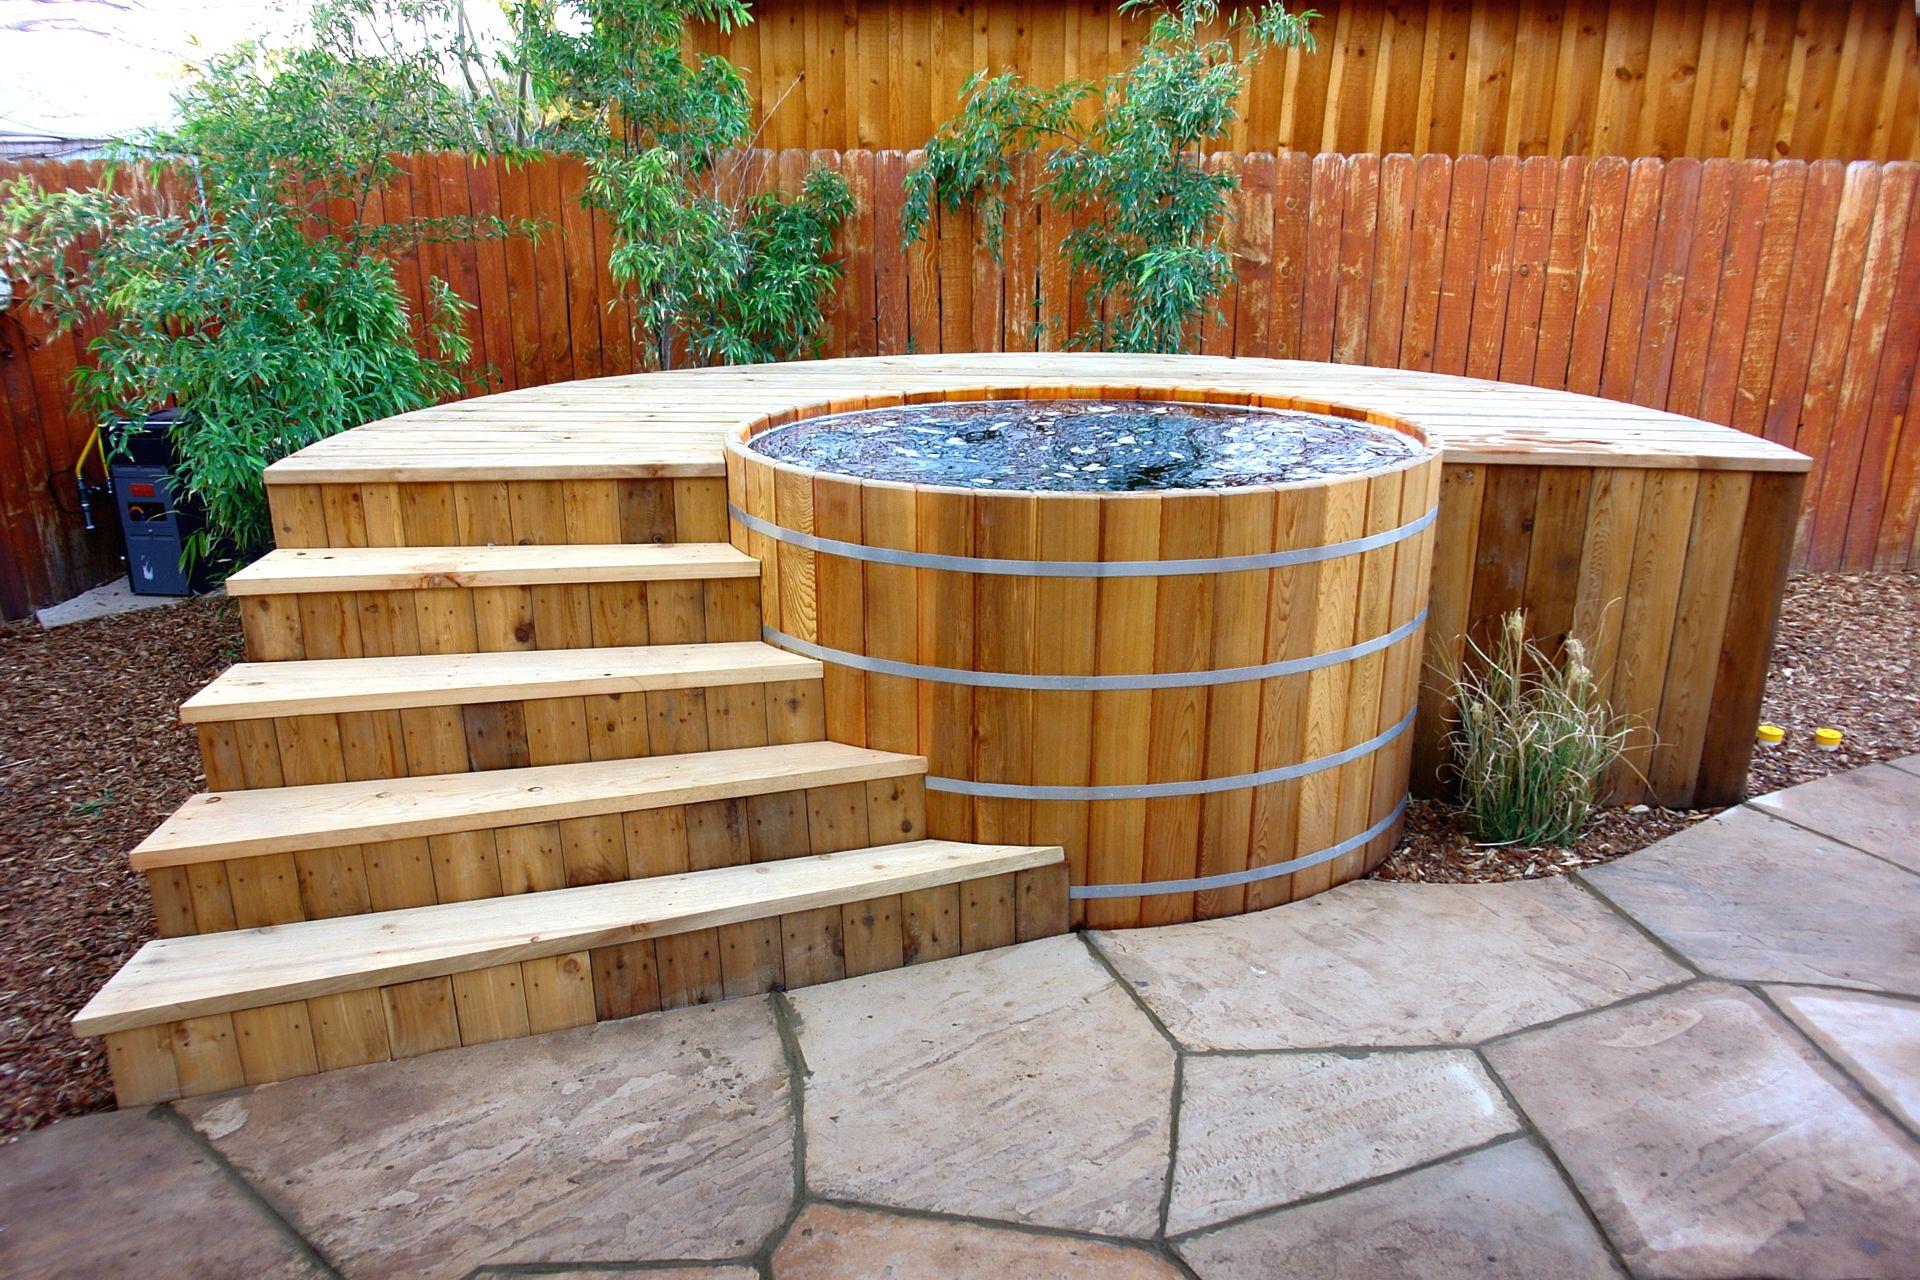 Cedar Hot Tub From Zen Bathworks With My Design Of A Cedar Deck Erin S Gardens